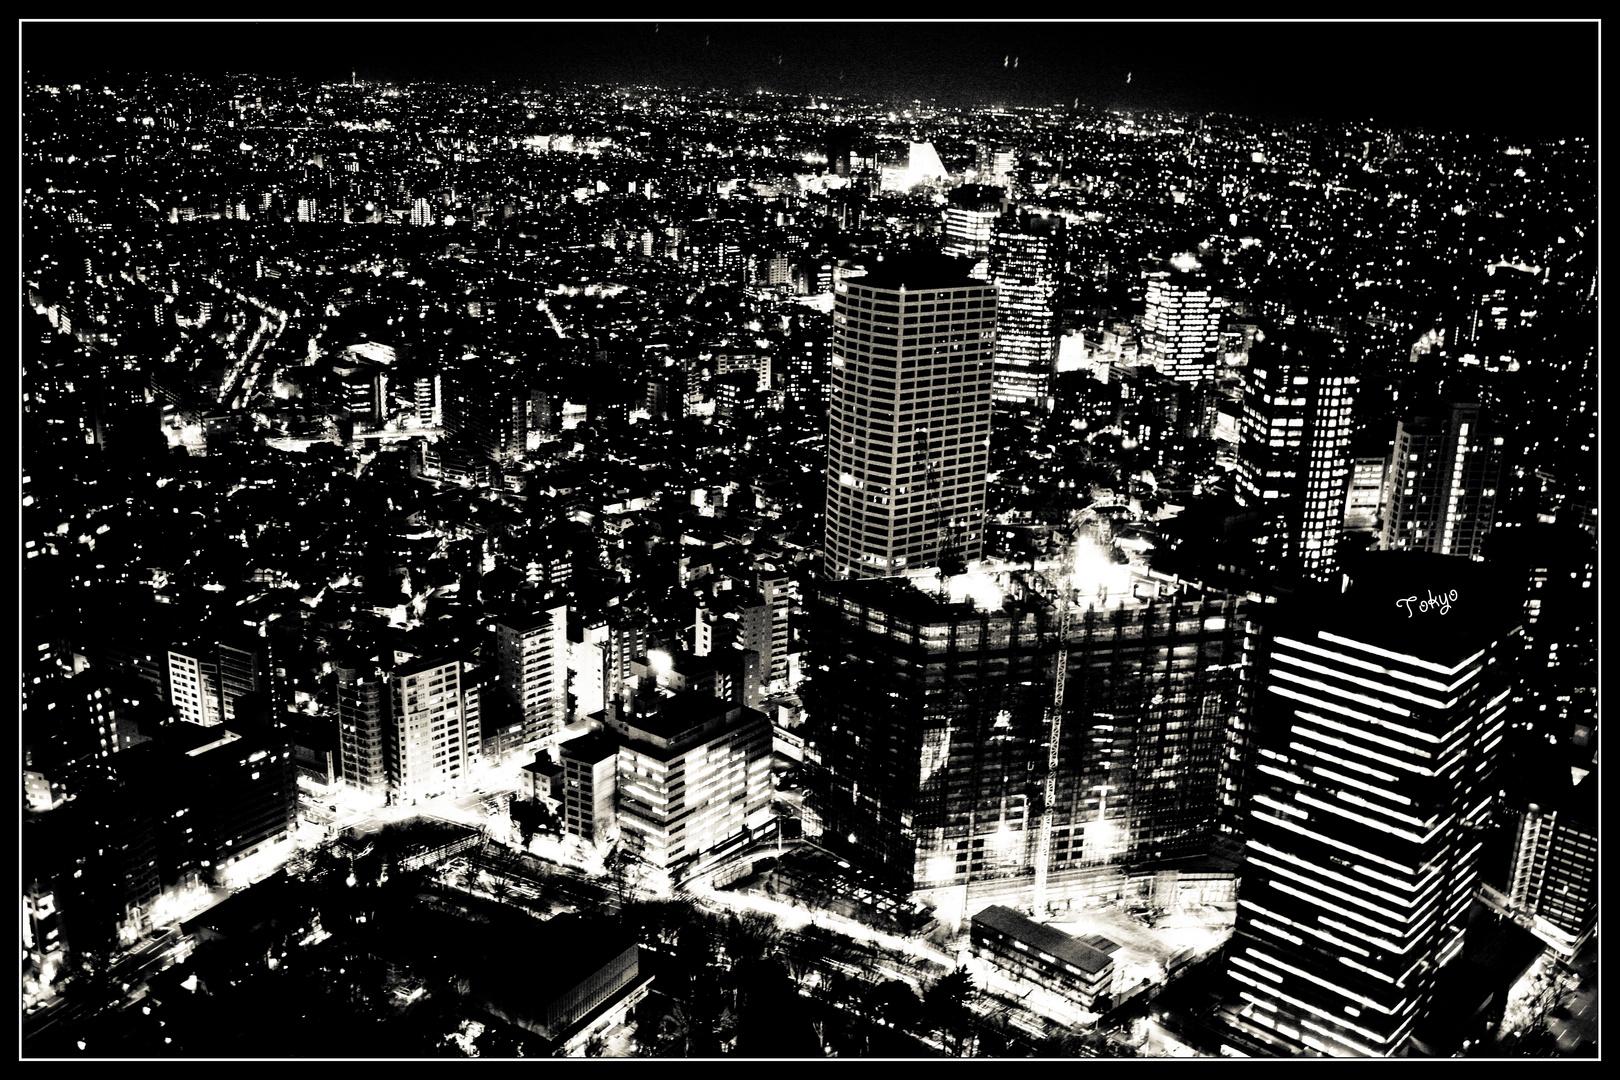 Tokyo night view b&w